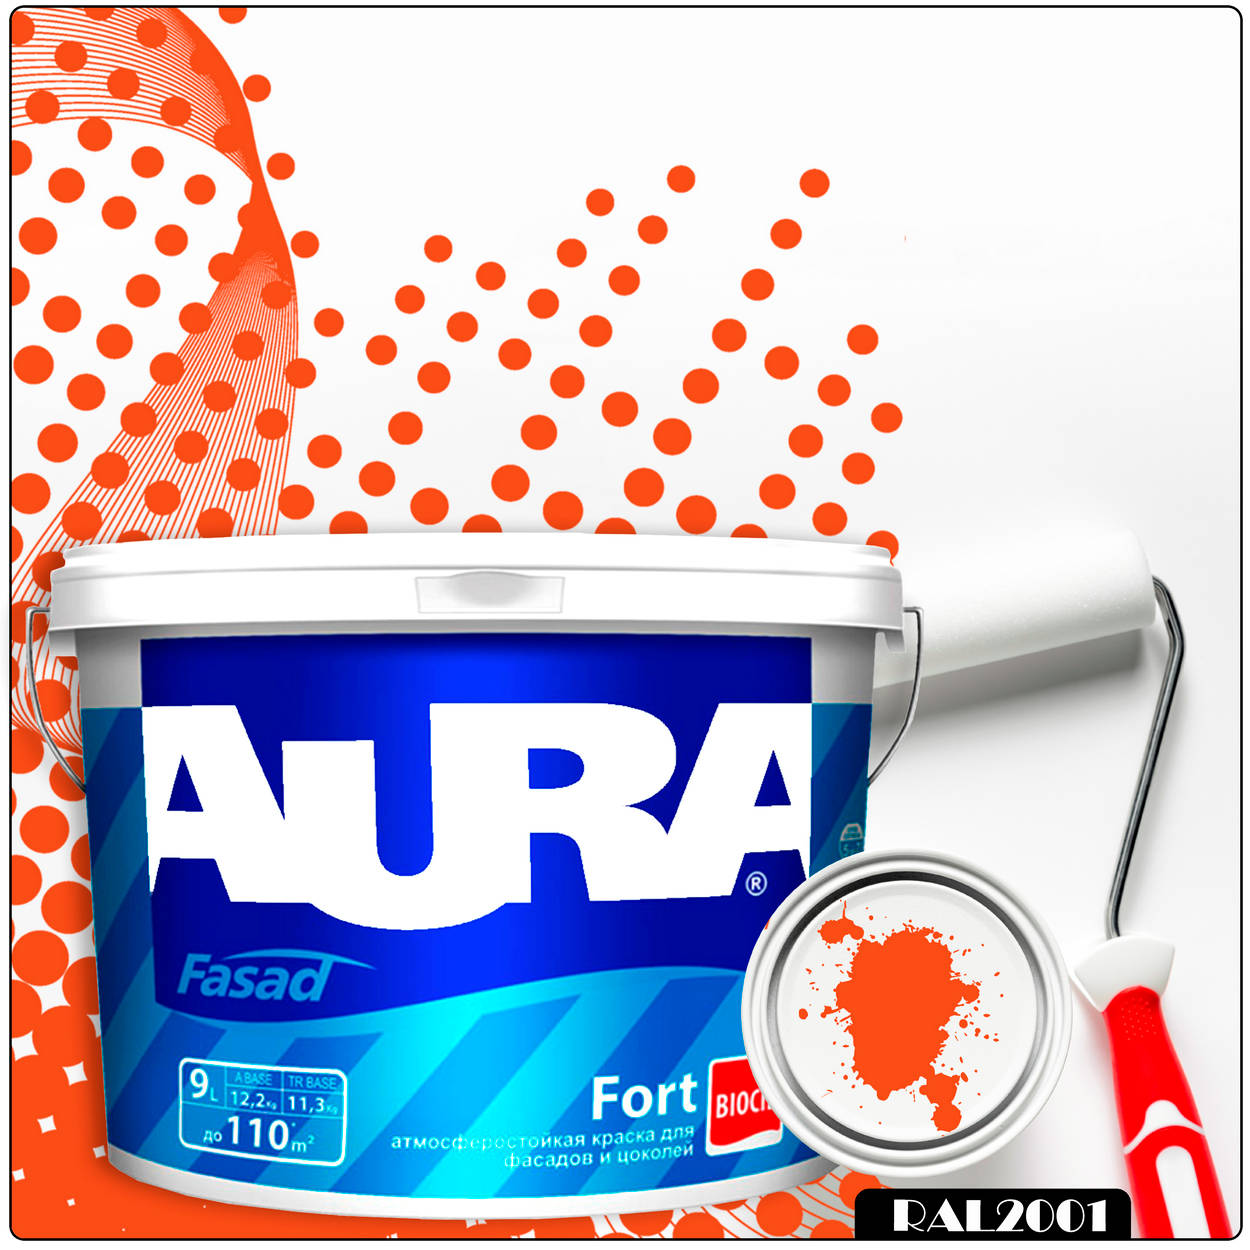 Фото 2 - Краска Aura Fasad Fort, RAL 2001 Красно-оранжевый, латексная, матовая, для фасада и цоколей, 9л, Аура.